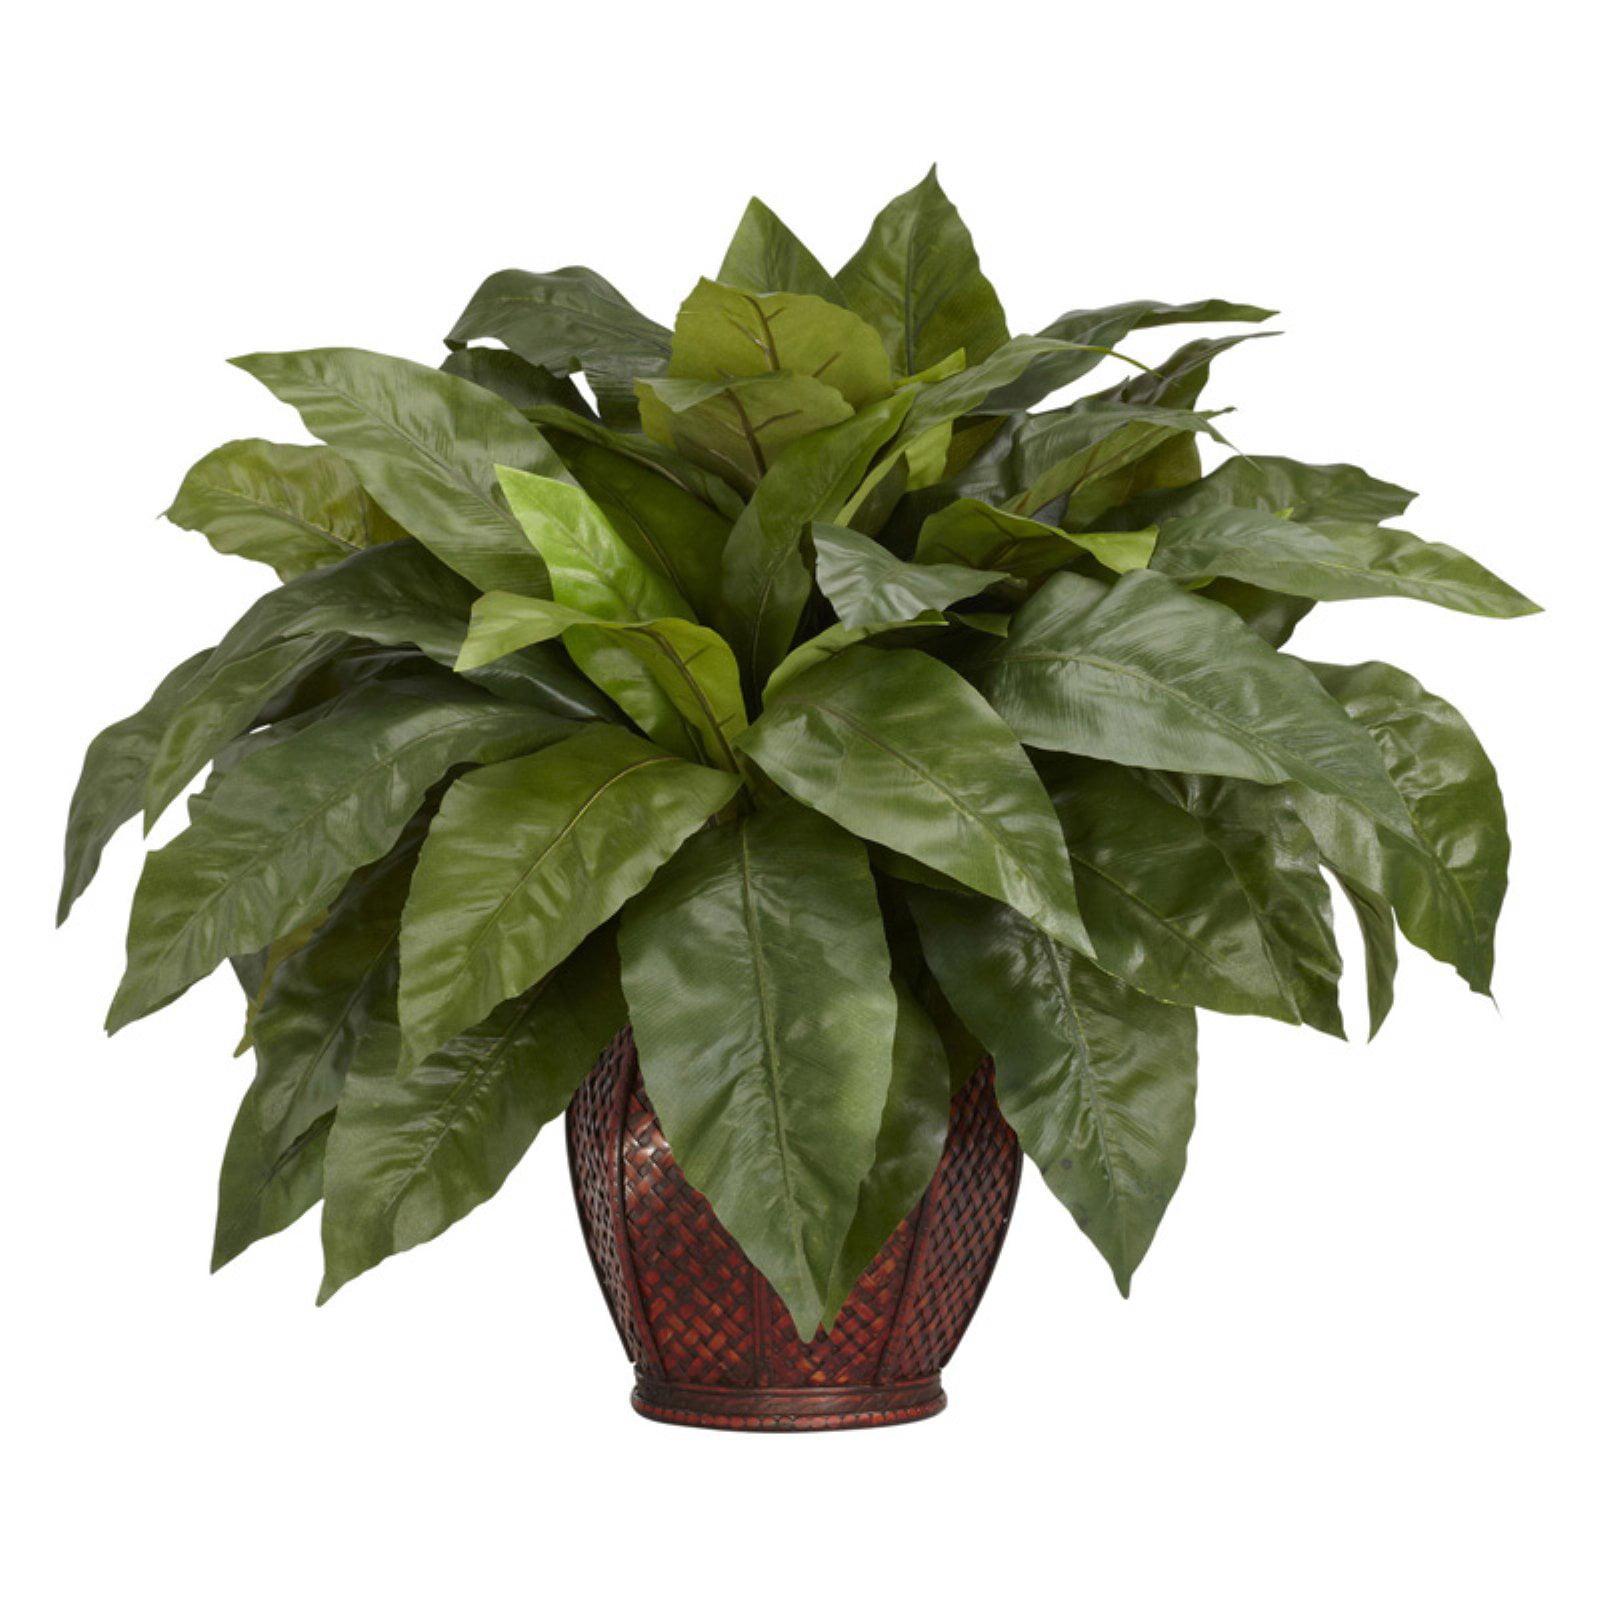 Birdsnest Fern with Decorative Vase Silk Plant